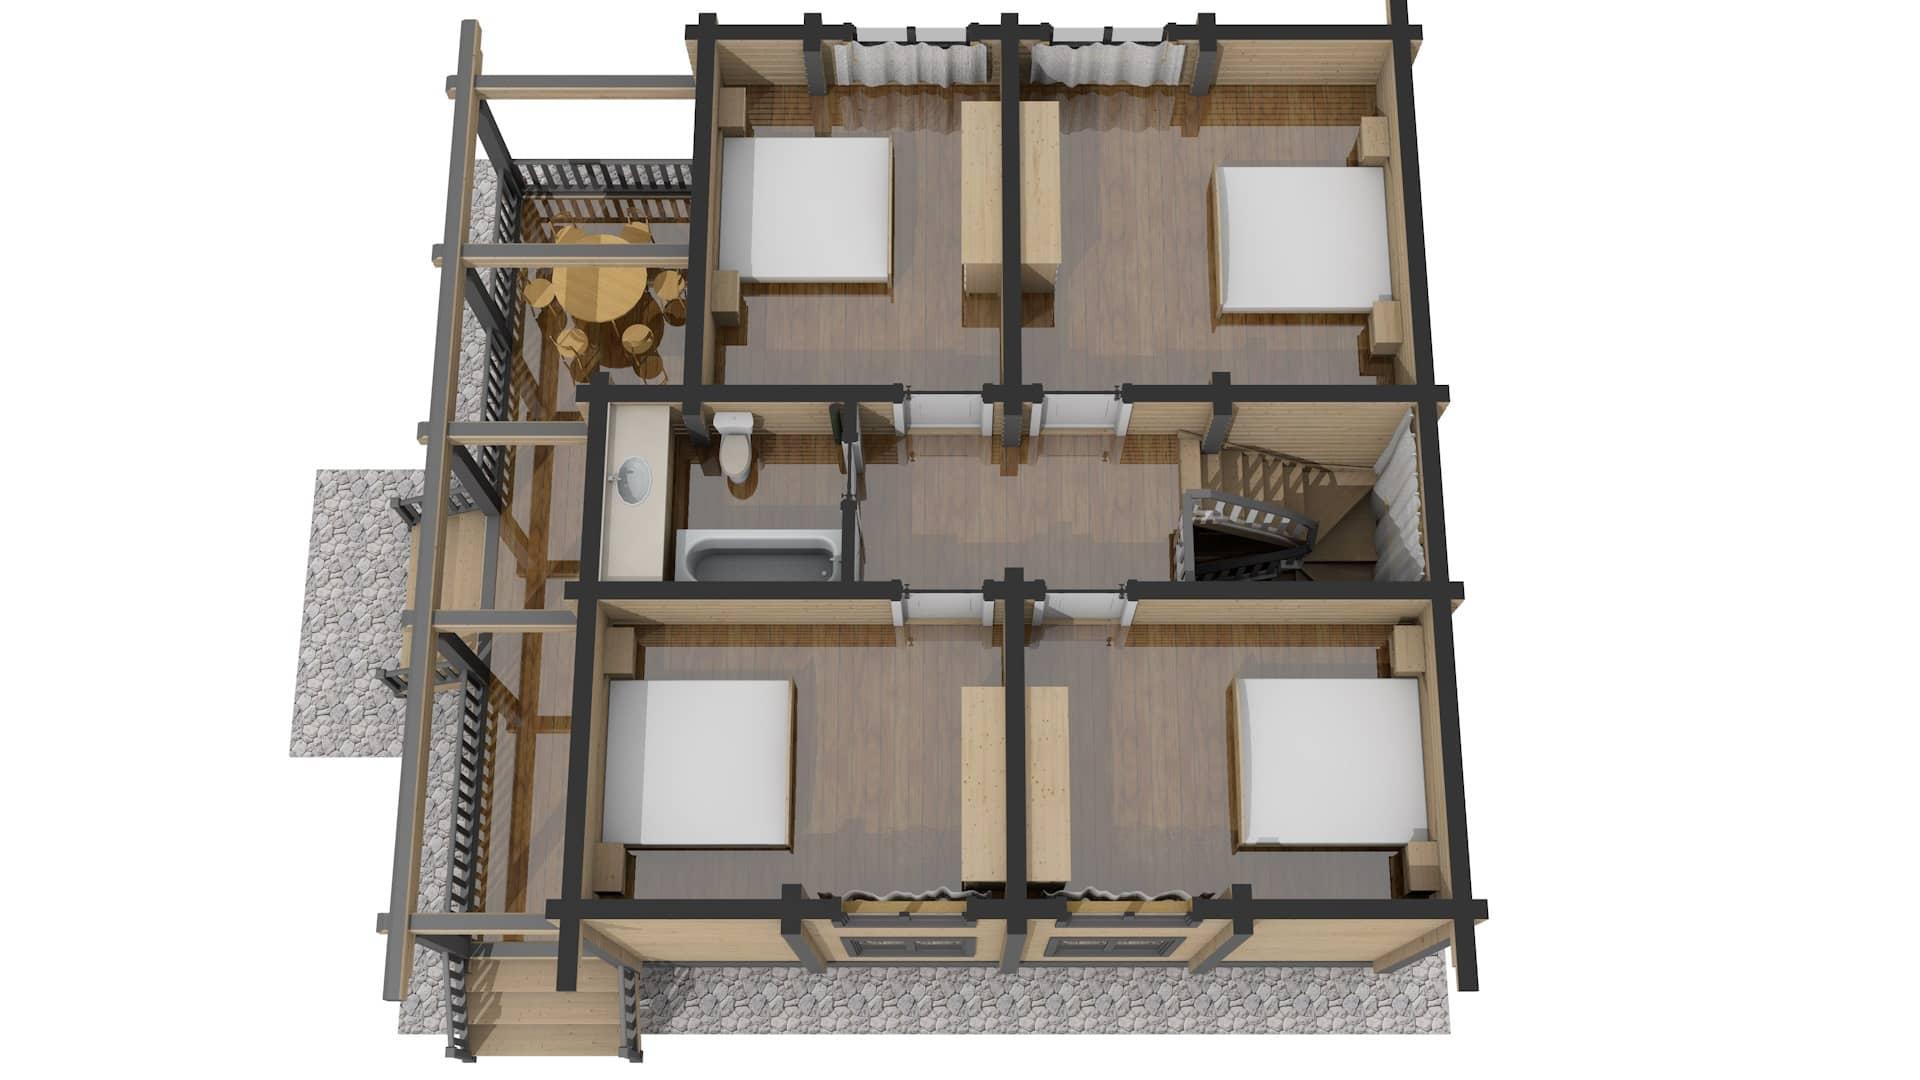 Проект дома из бруса Малиновка - План 2 этажа 3D